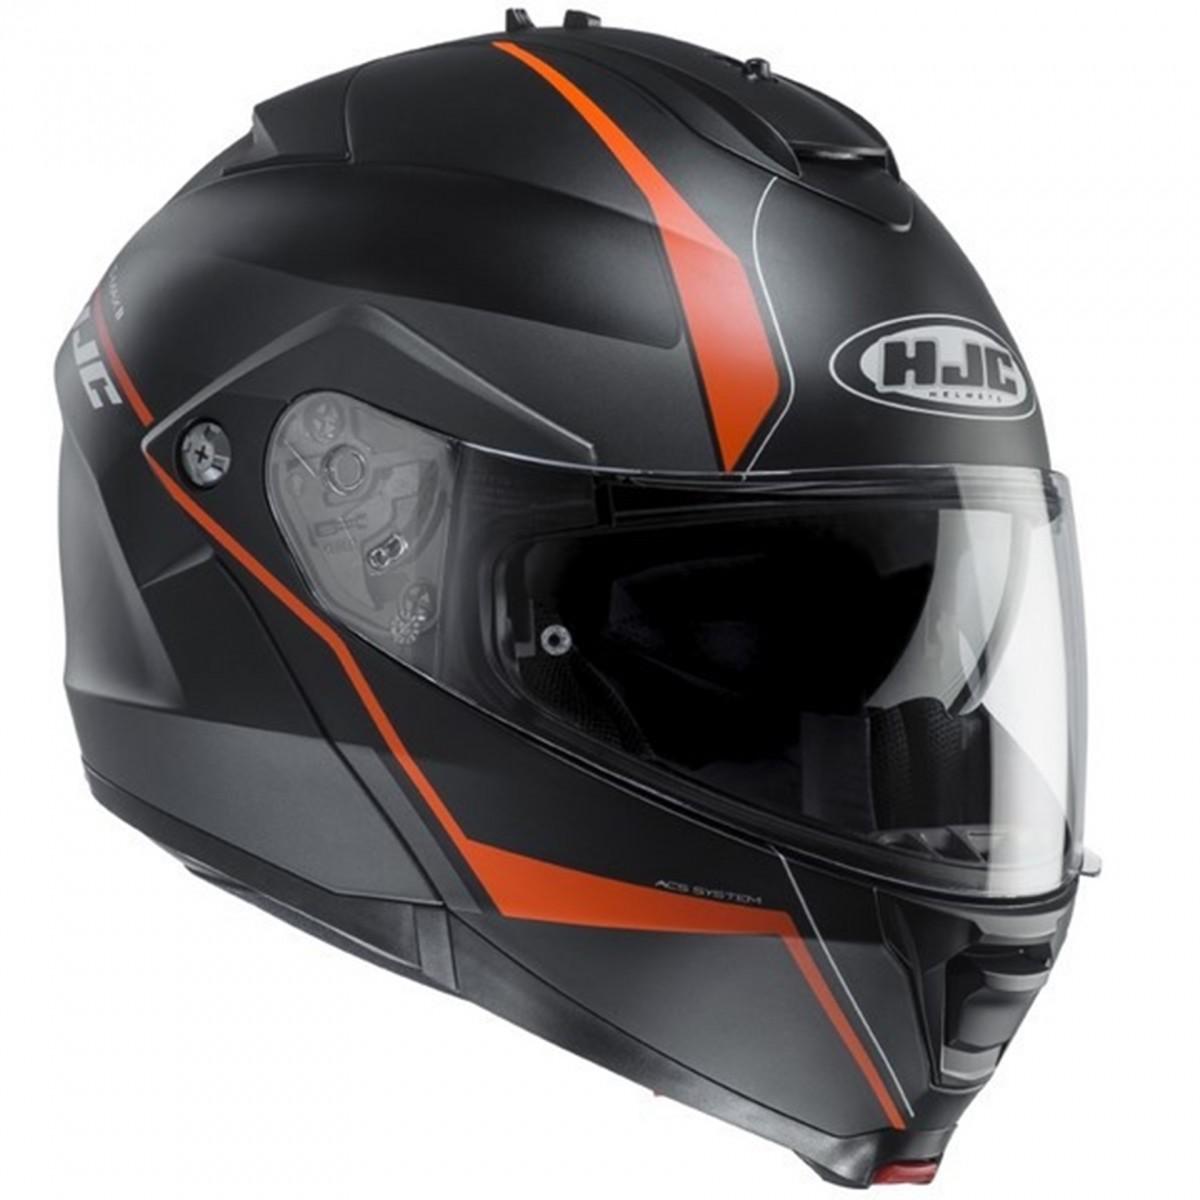 77e779574de52 HJC logo Casco HJC IS-Max II Mine negro  naranja